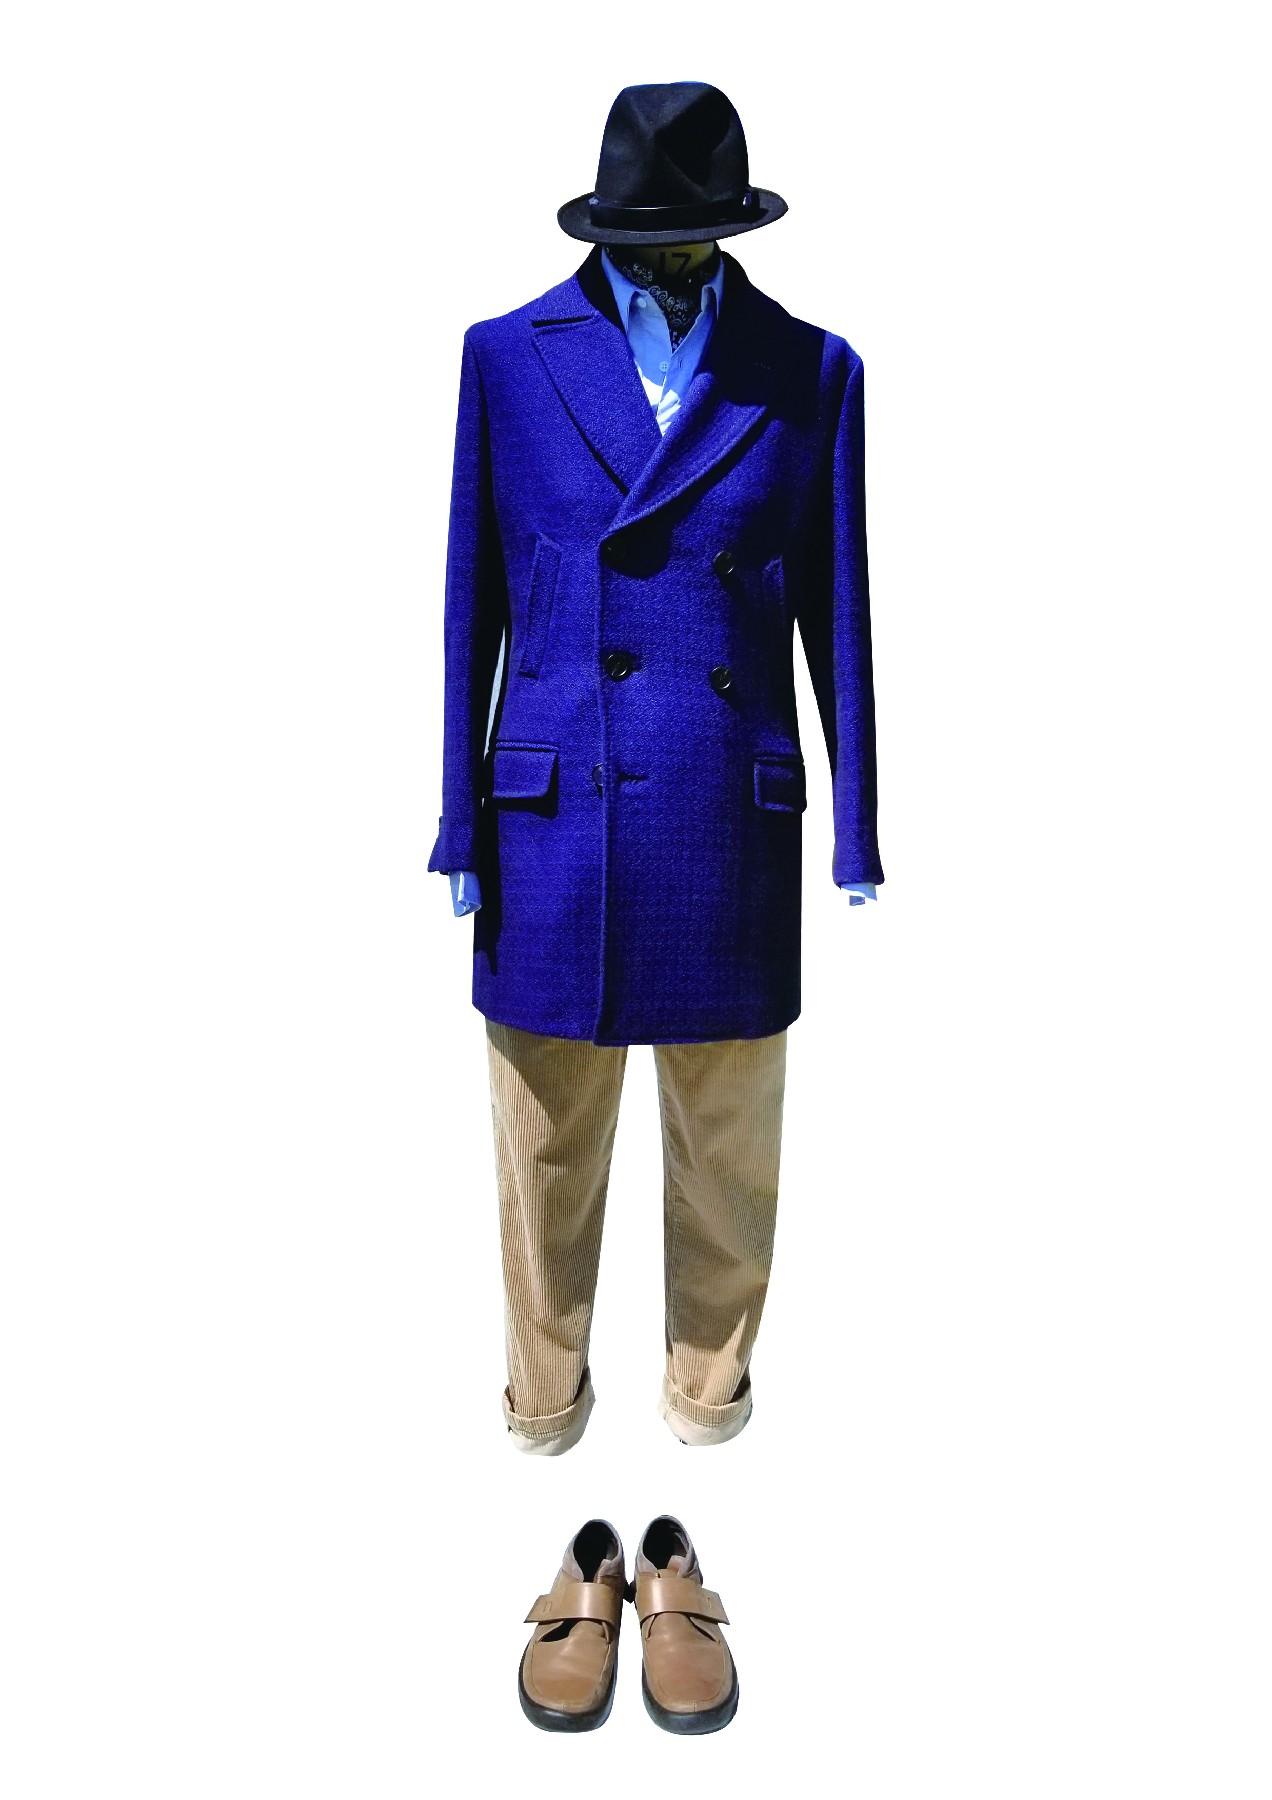 COPIHUE CLOTHING Array image13